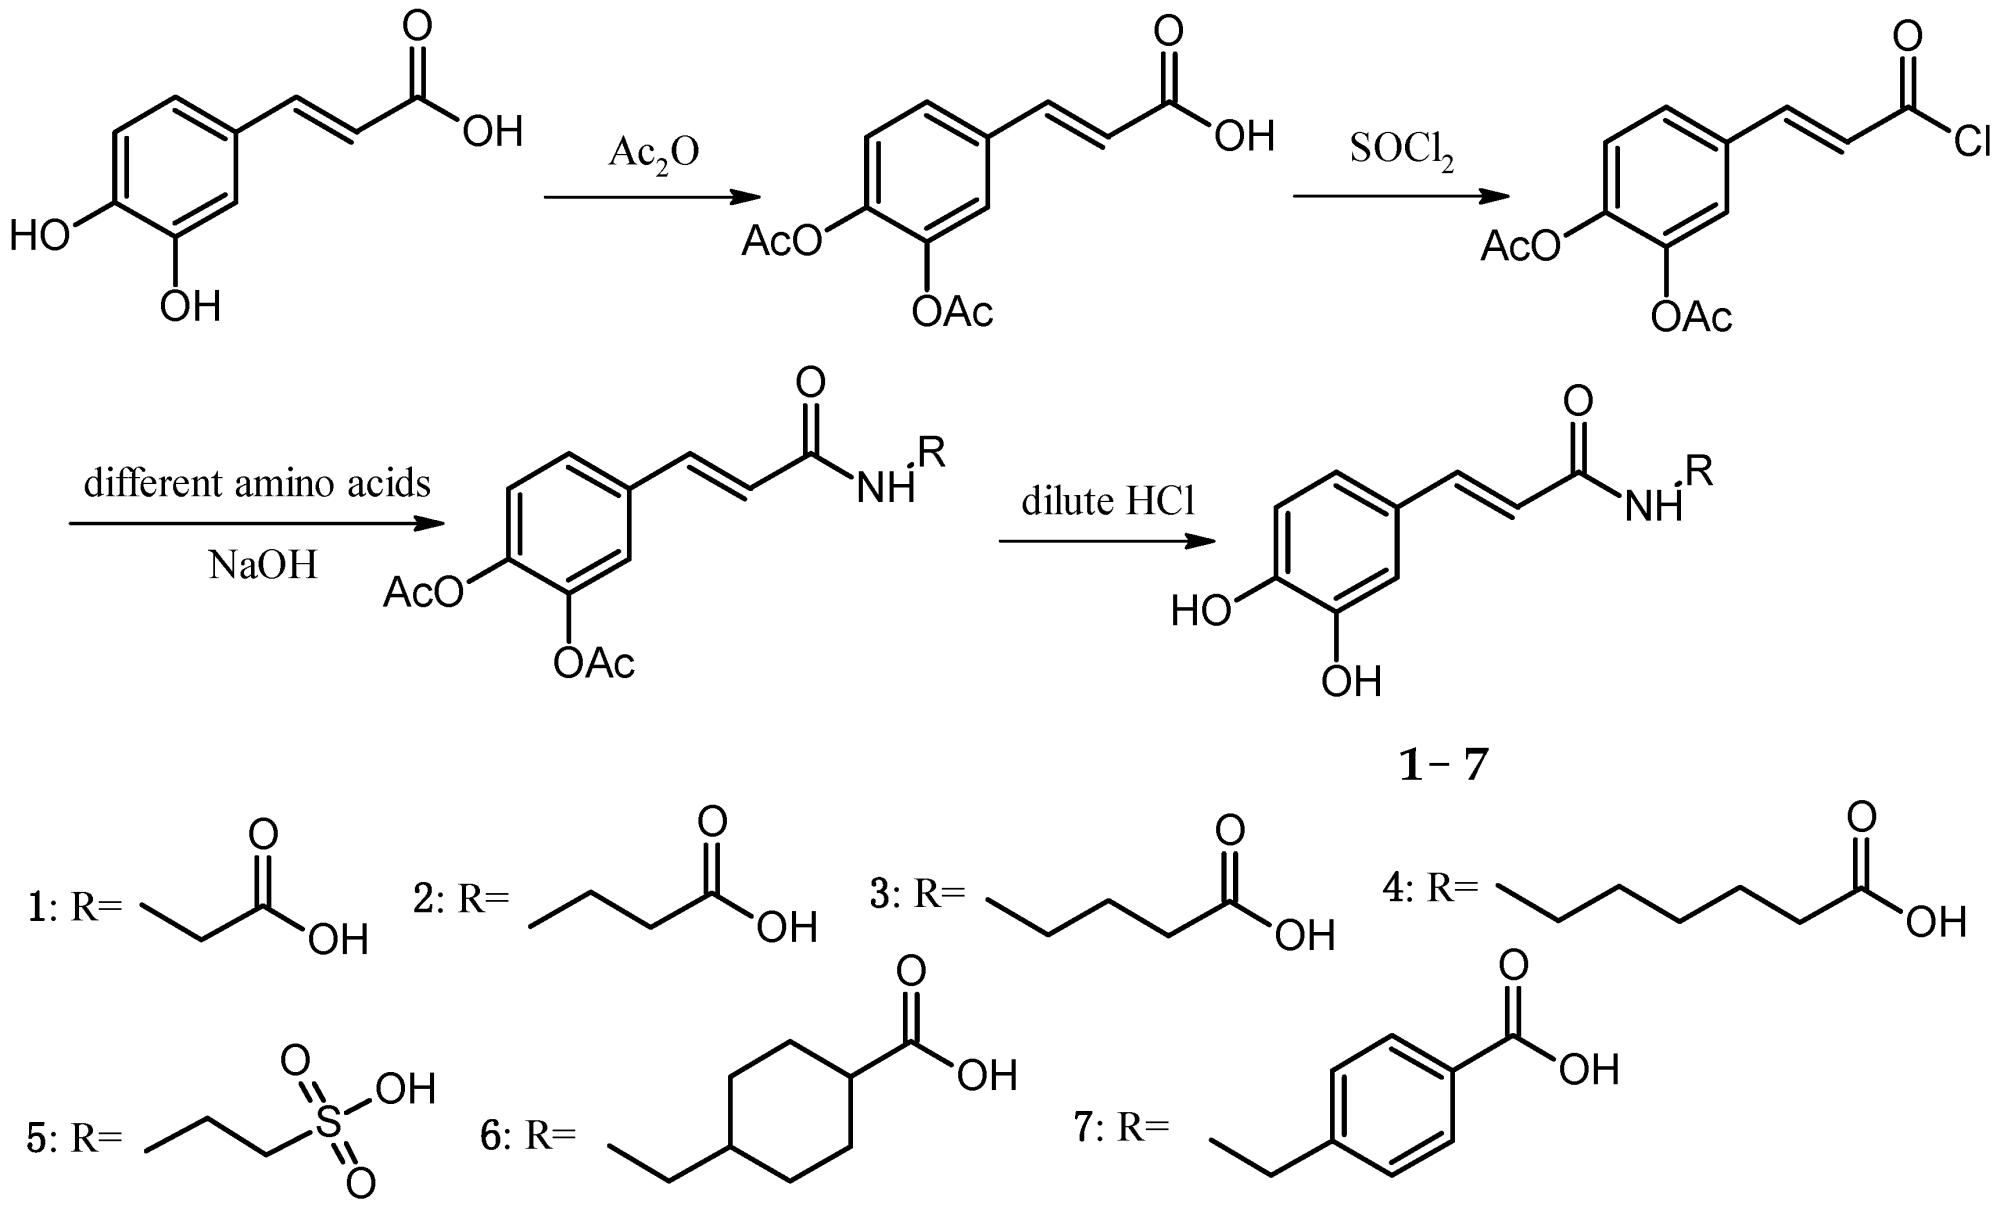 hight resolution of molecules 22 02047 sch001